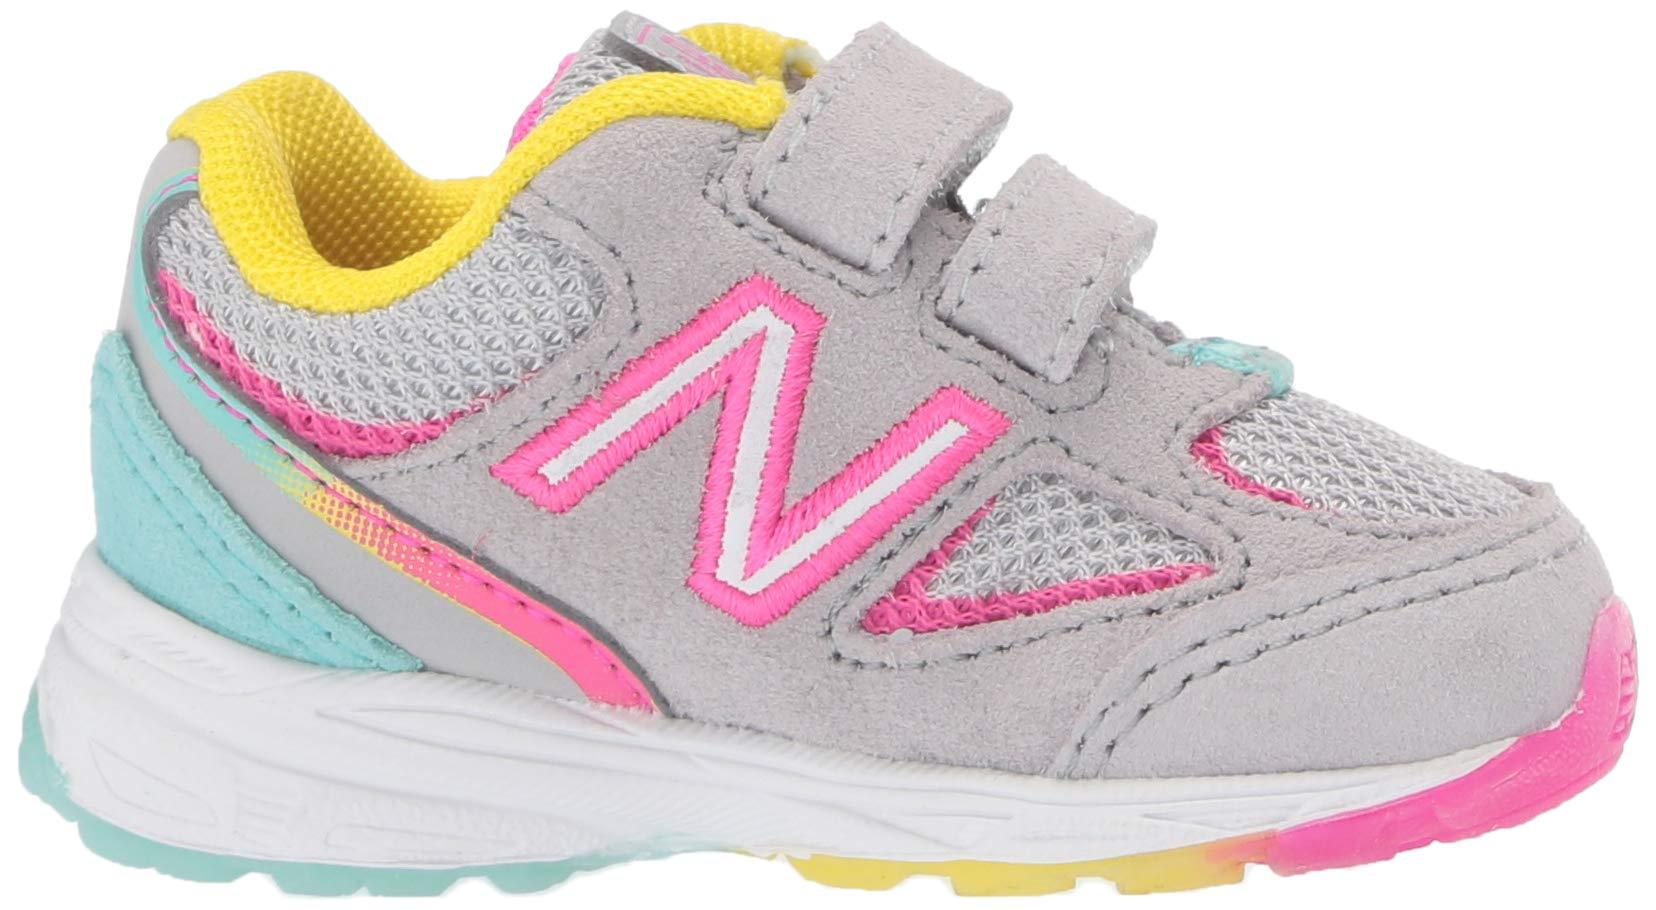 New Balance Girls' 888v2 Hook and Loop Running Shoe, Grey/Rainbow, 2 W US Infant by New Balance (Image #7)